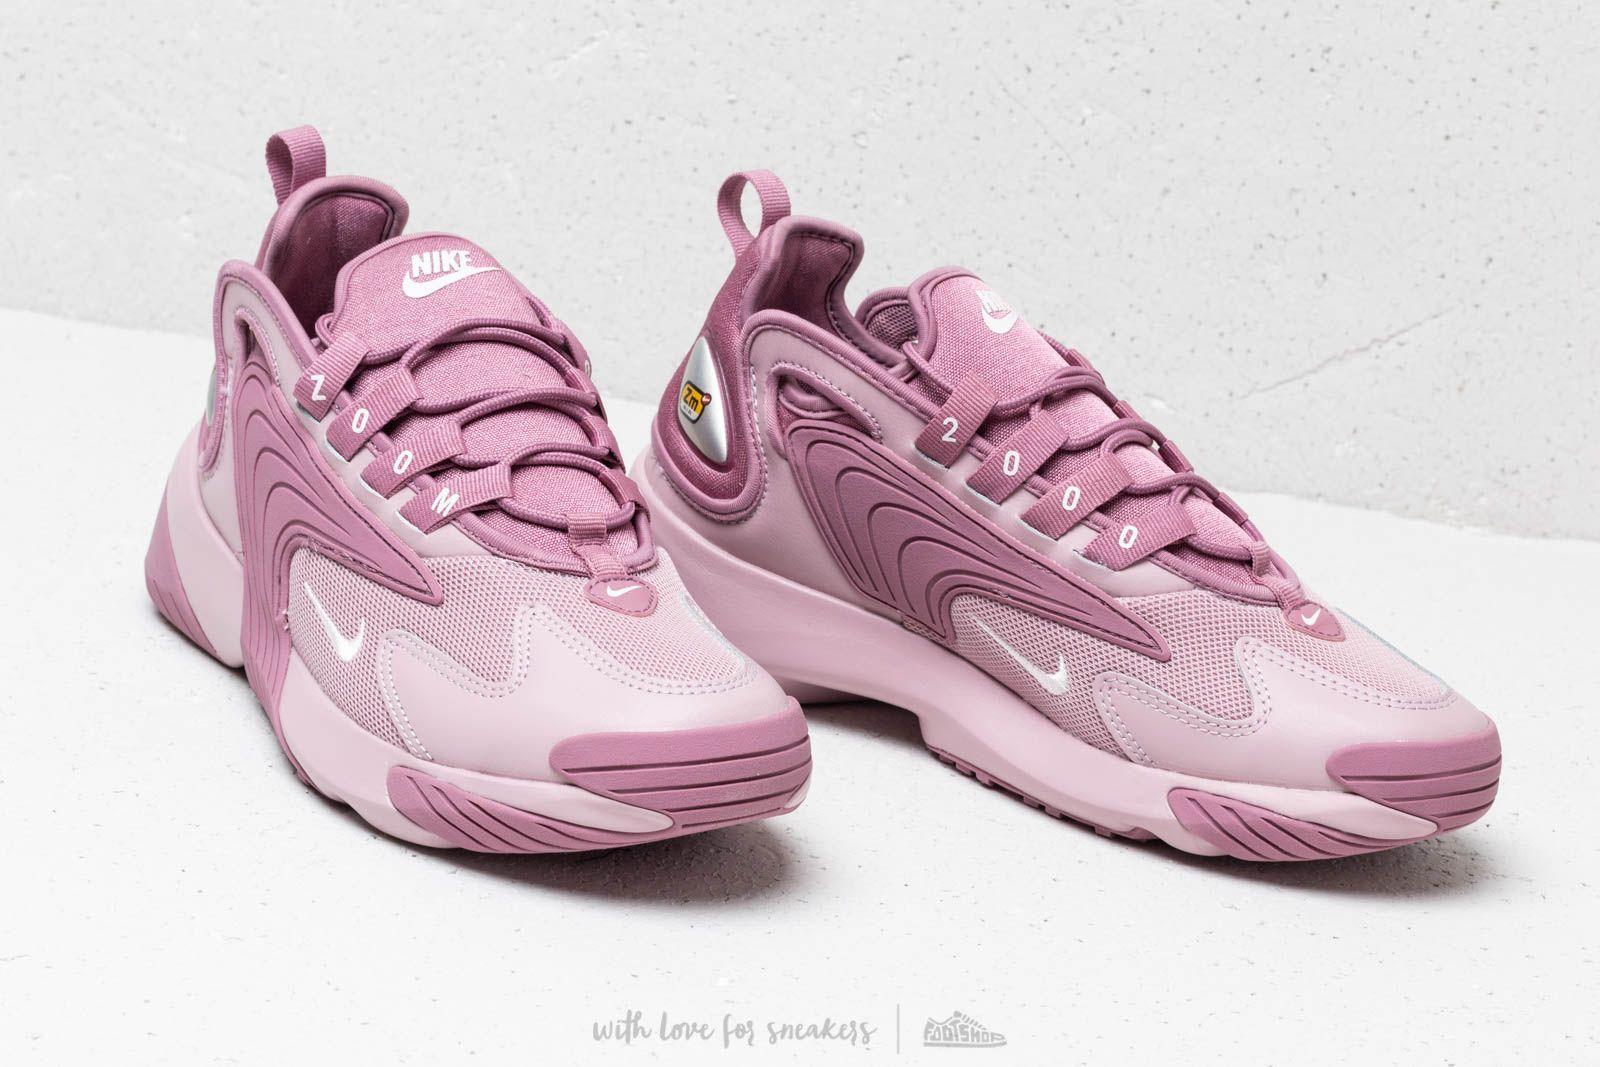 Chaussures NIKE Wmns Zoom 2K AO0354 500 Plum DustPale PinkPlum Chalk